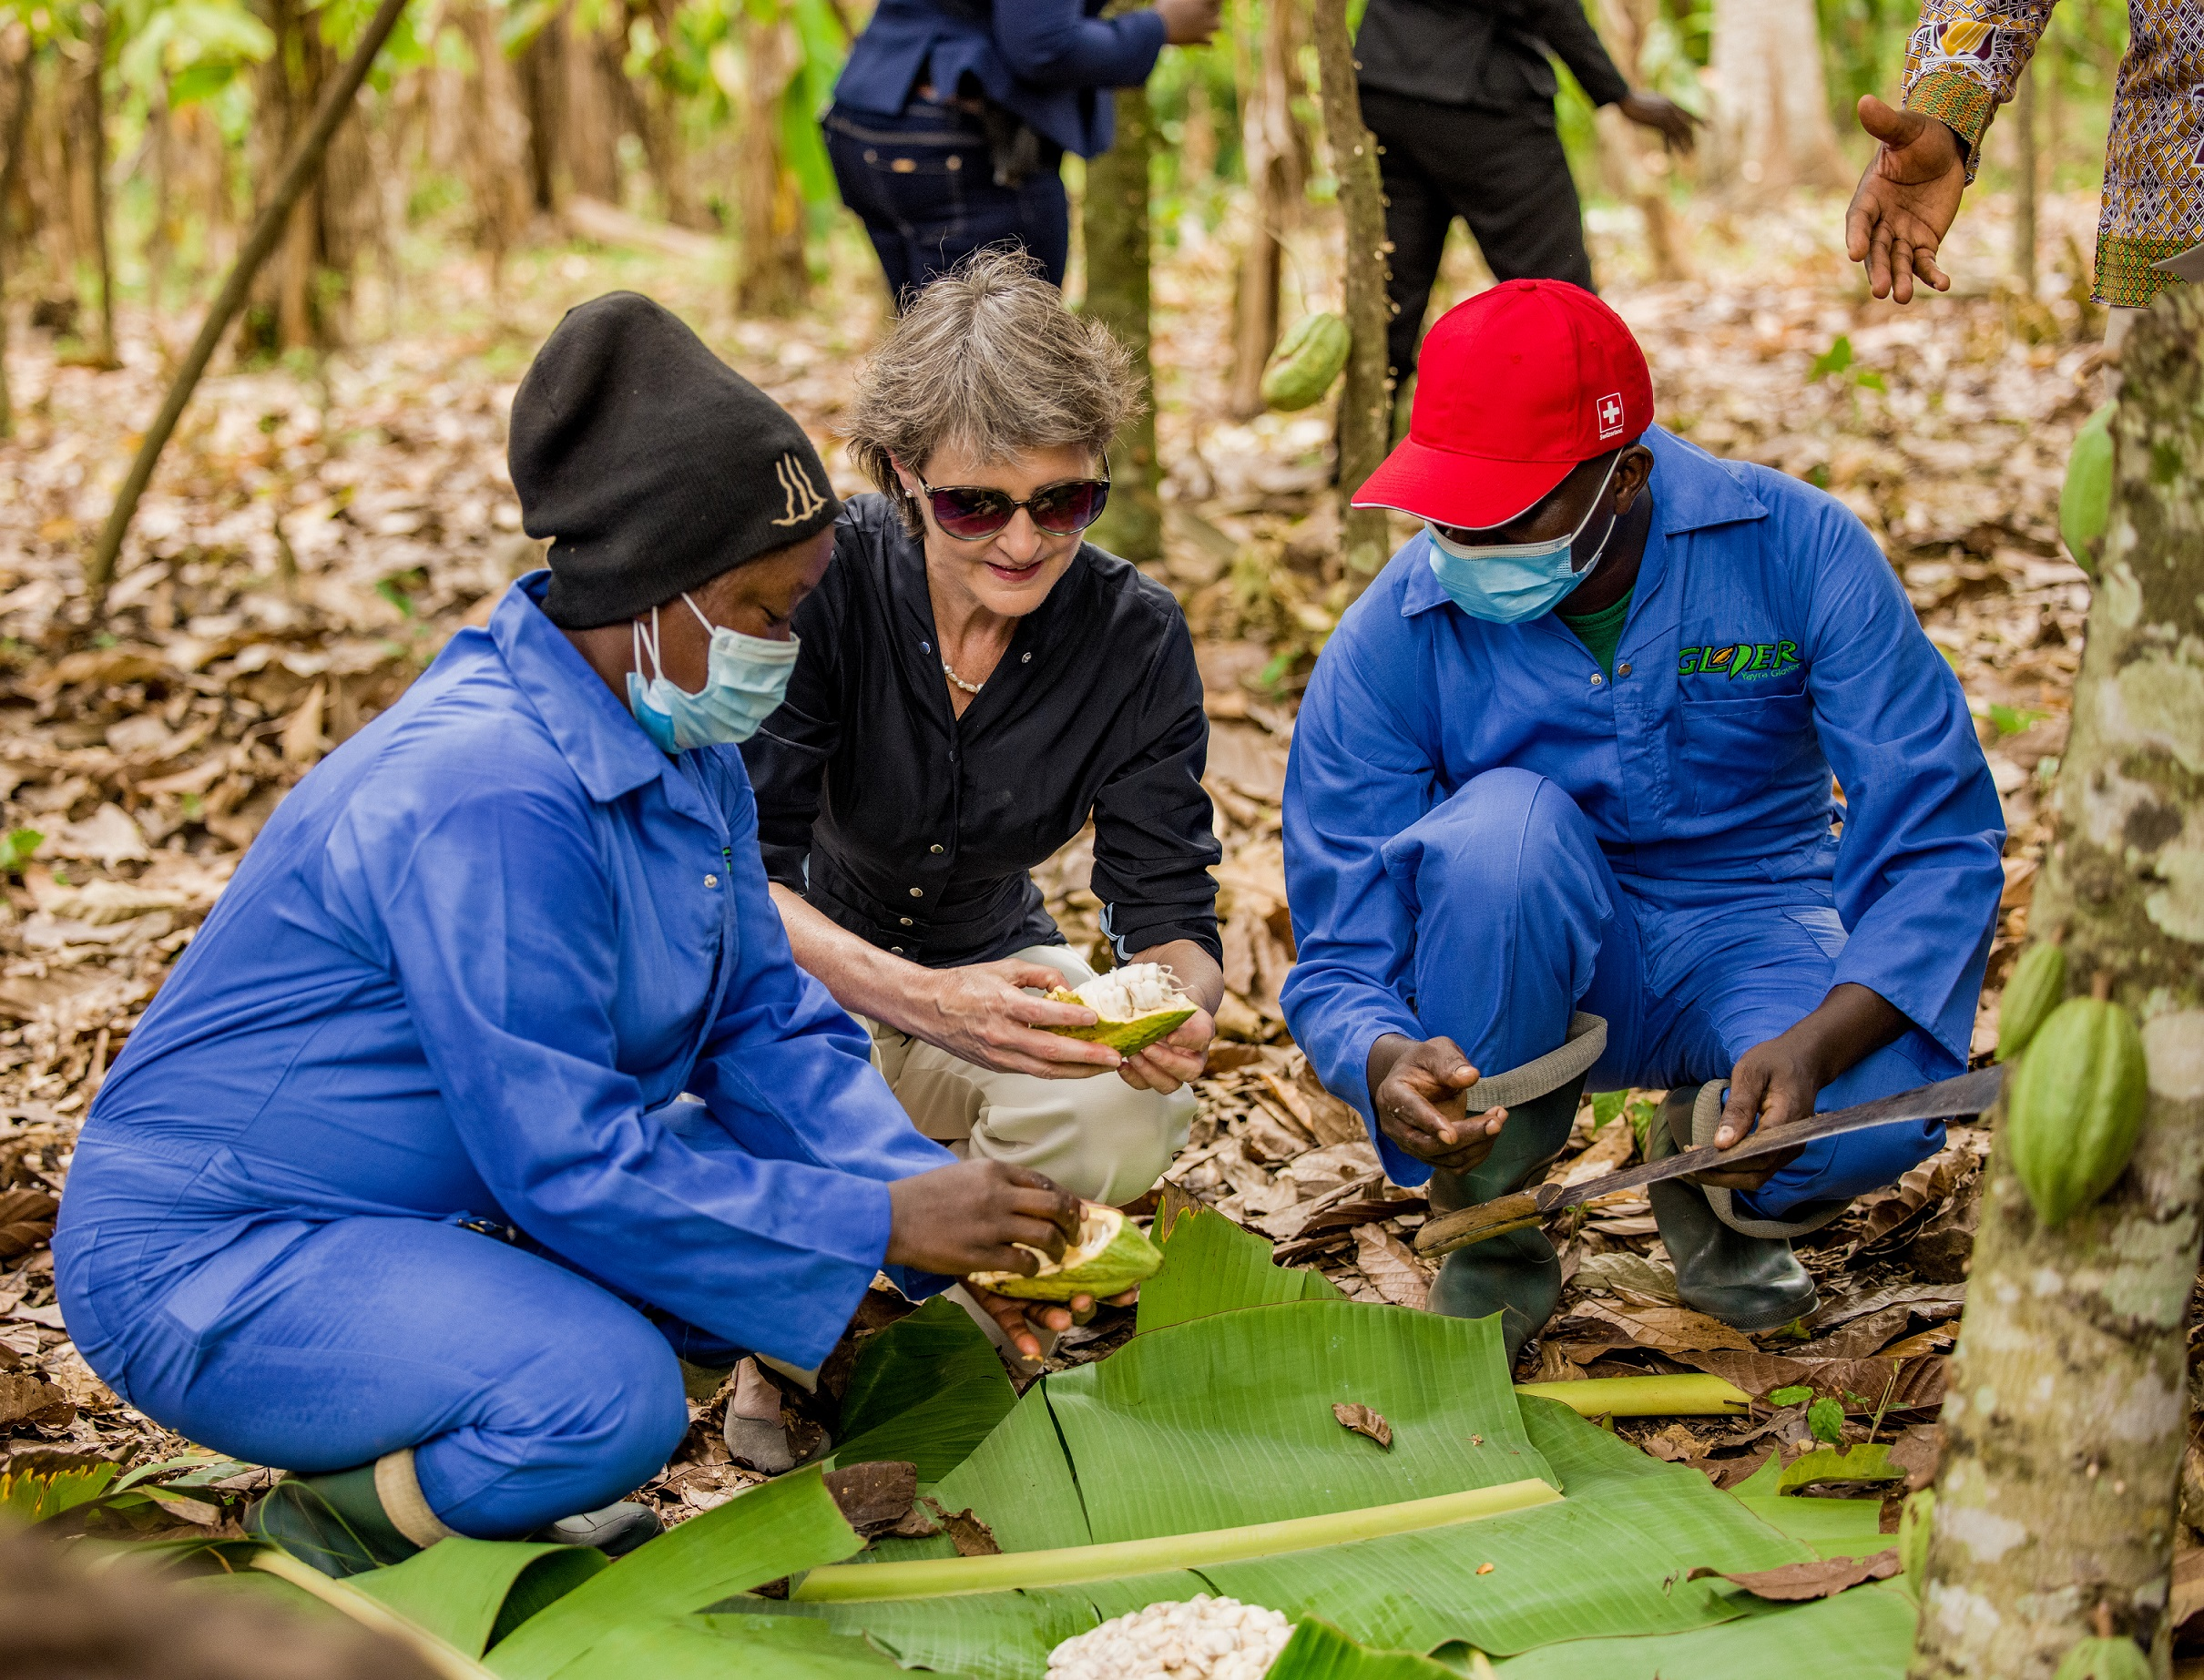 Swiss Federal Councillor visits organic cocoa farm at YGL